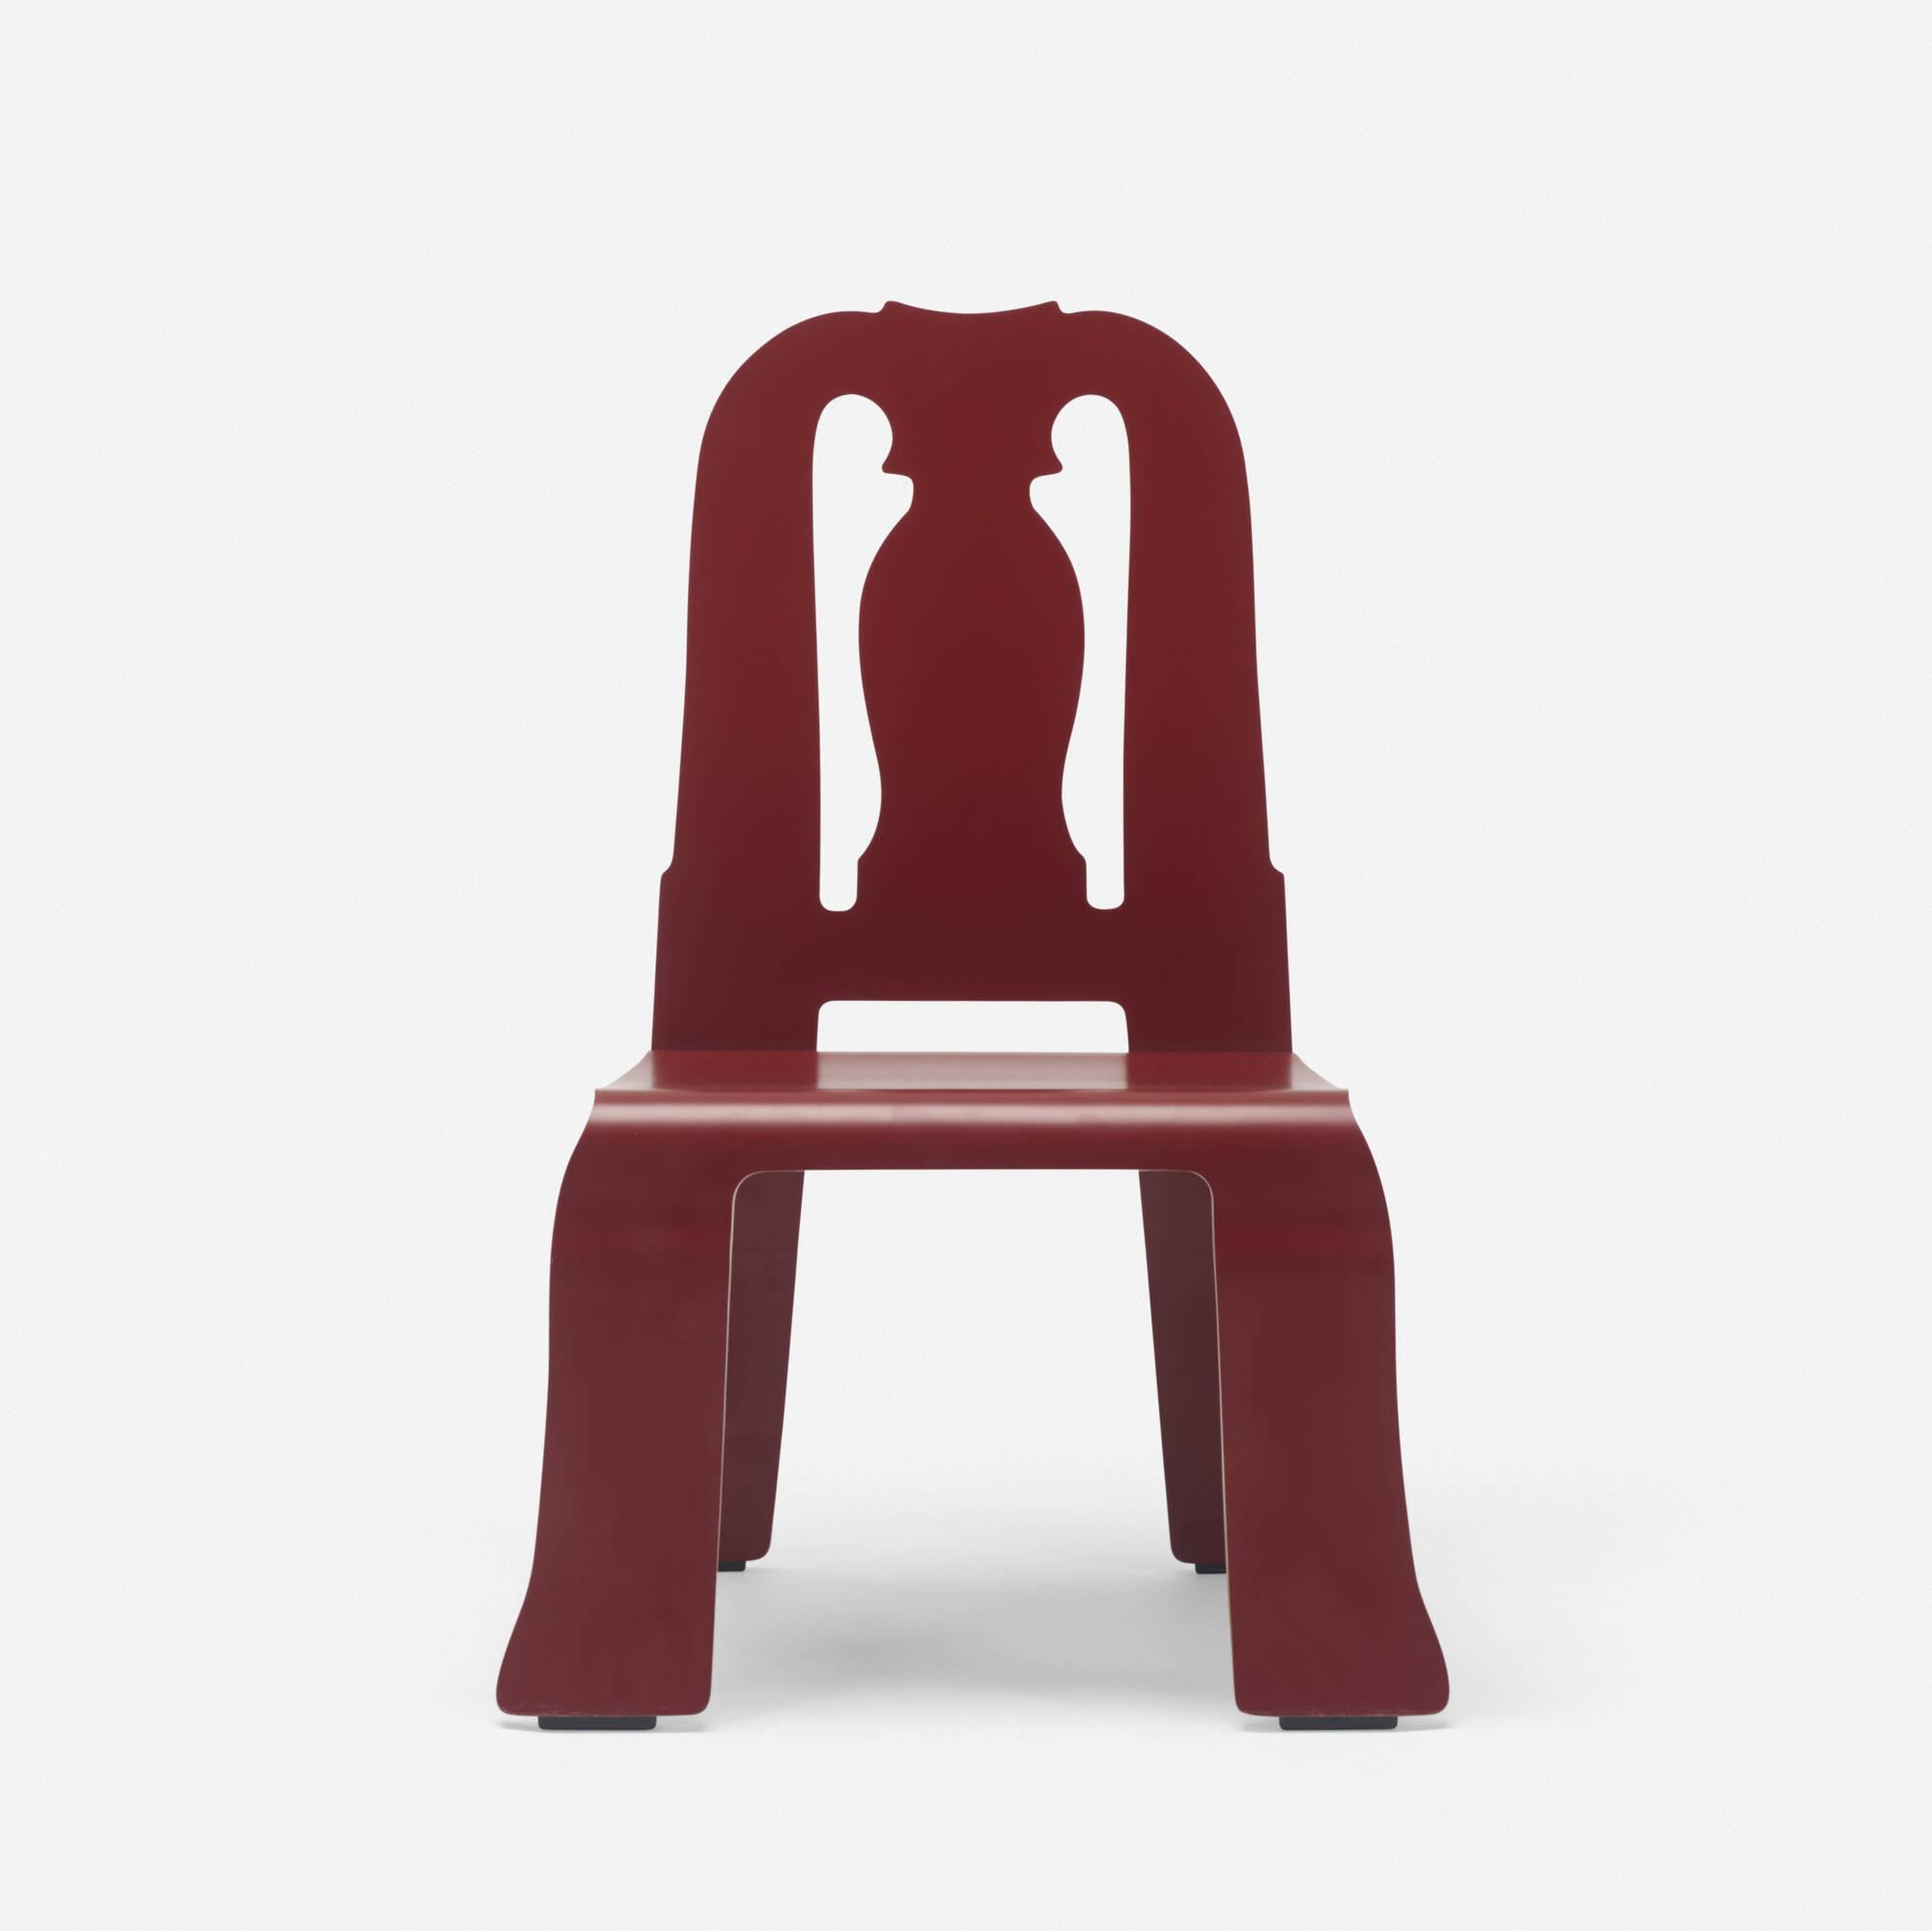 406: Robert Venturi / Queen Anne chair (1 of 2)